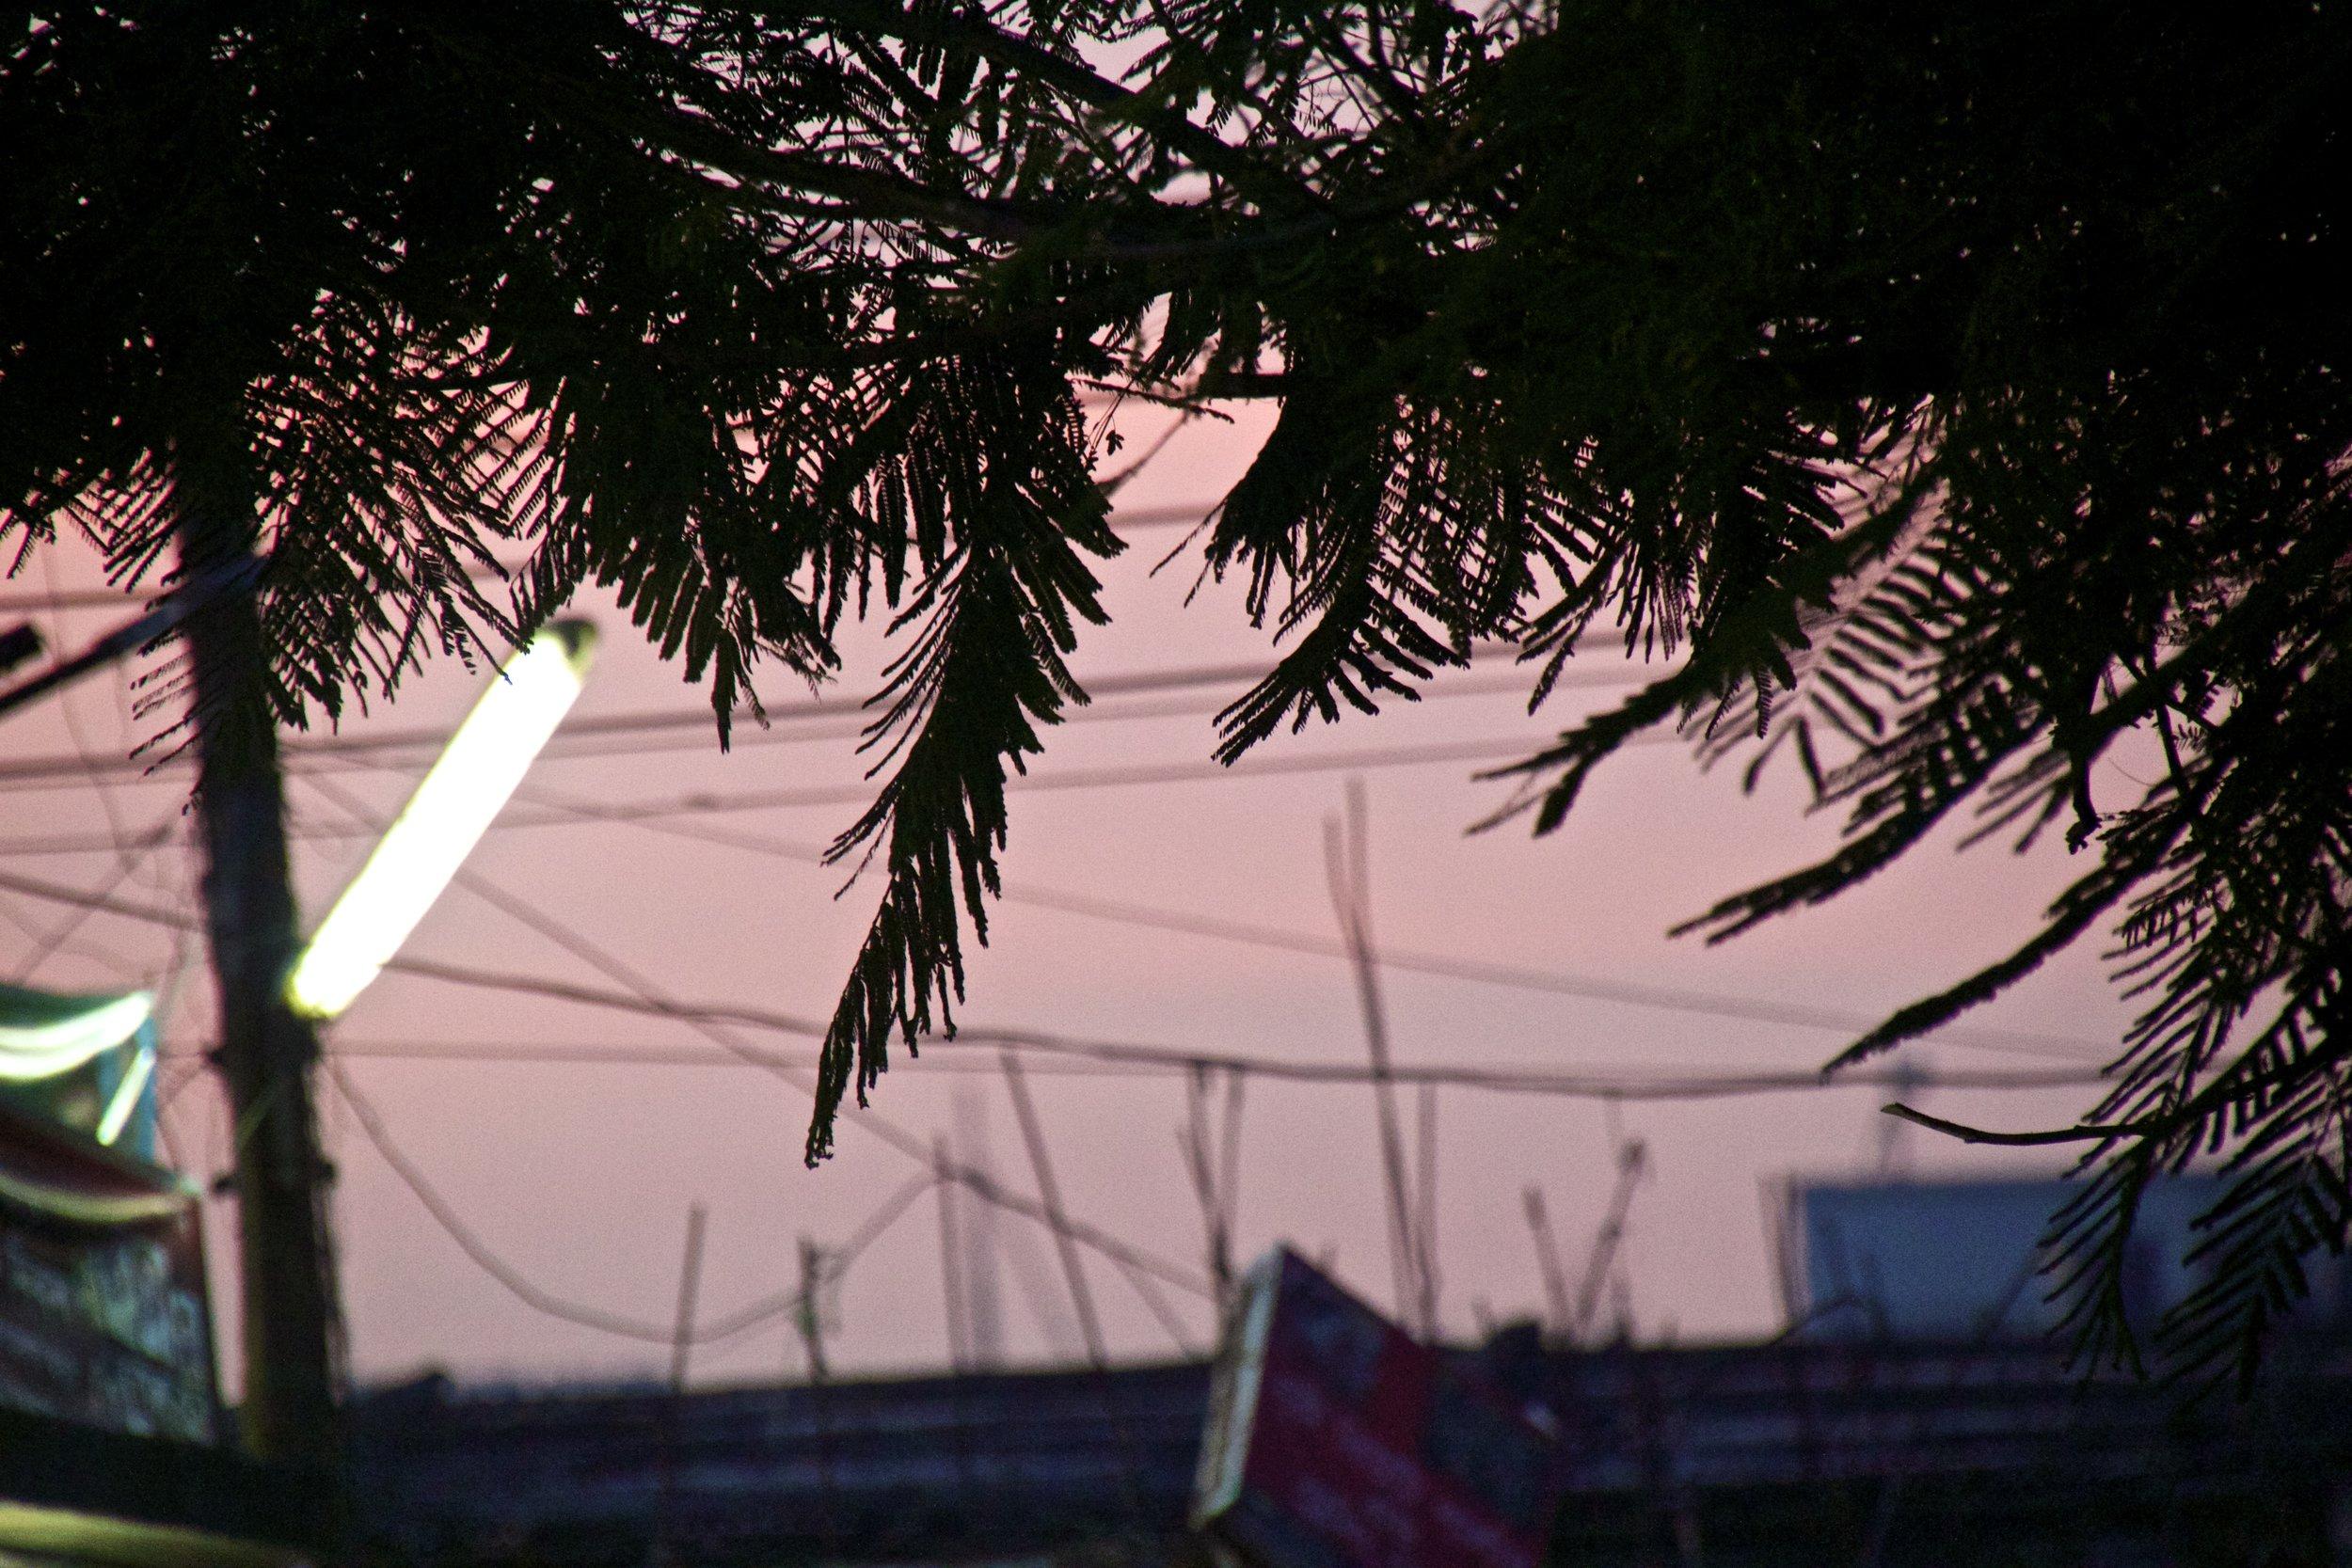 rayer bazar dhaka slums sunset 8.jpg